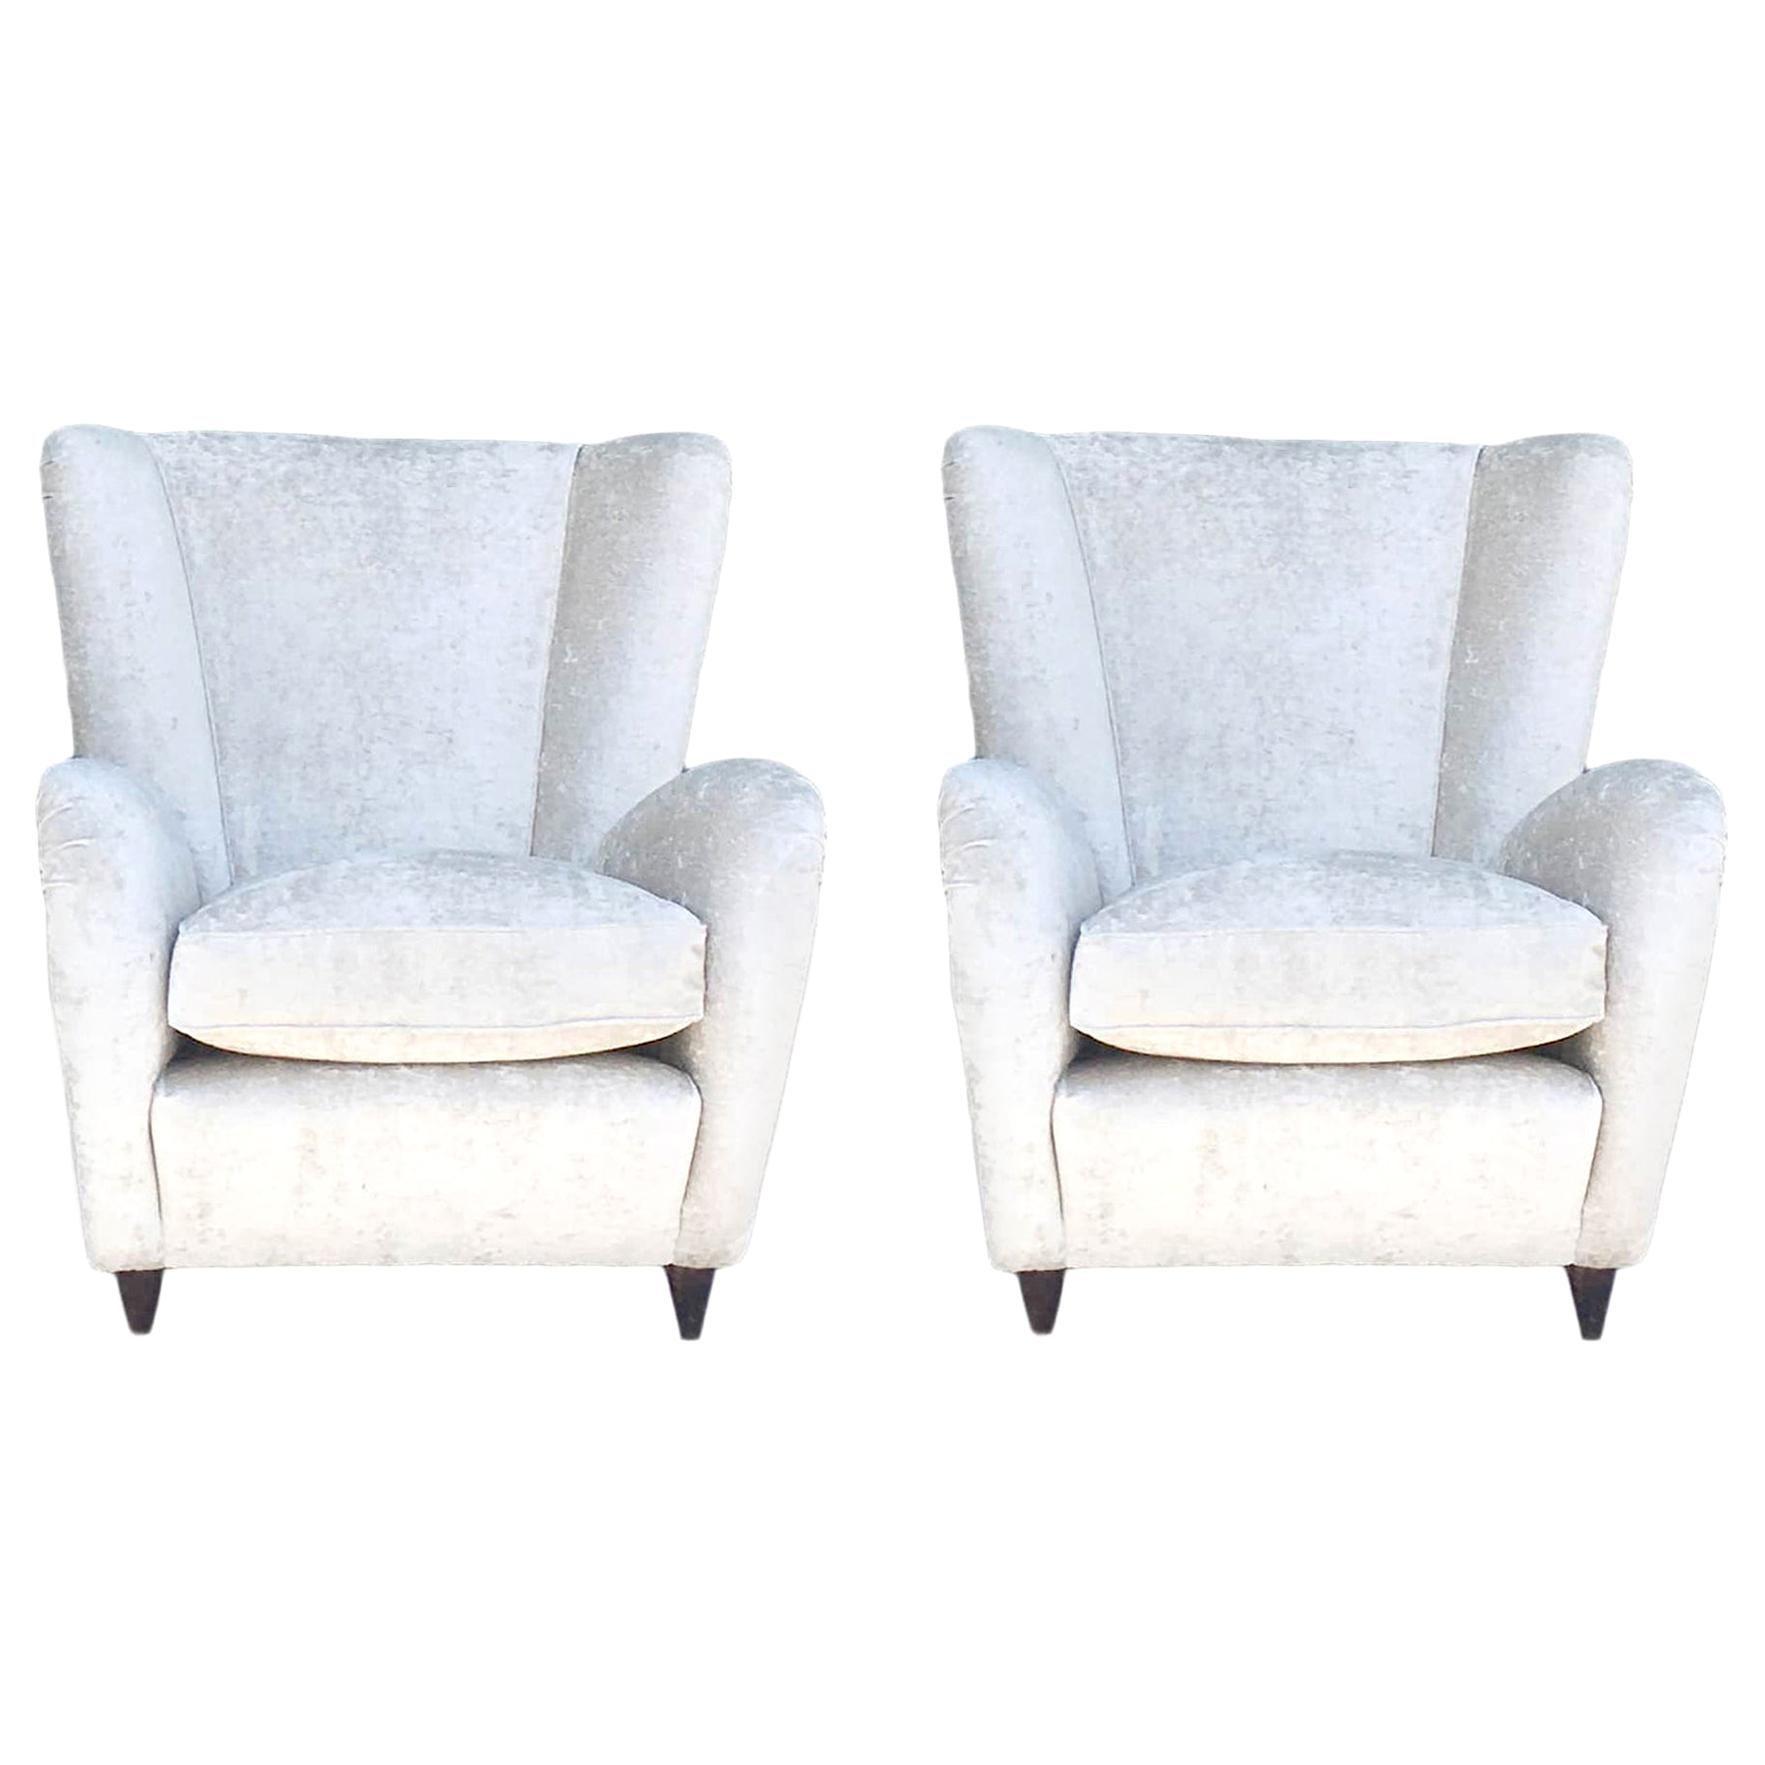 20th Century White Paolo Buffa Lounge Chairs, Italian Corner Chairs